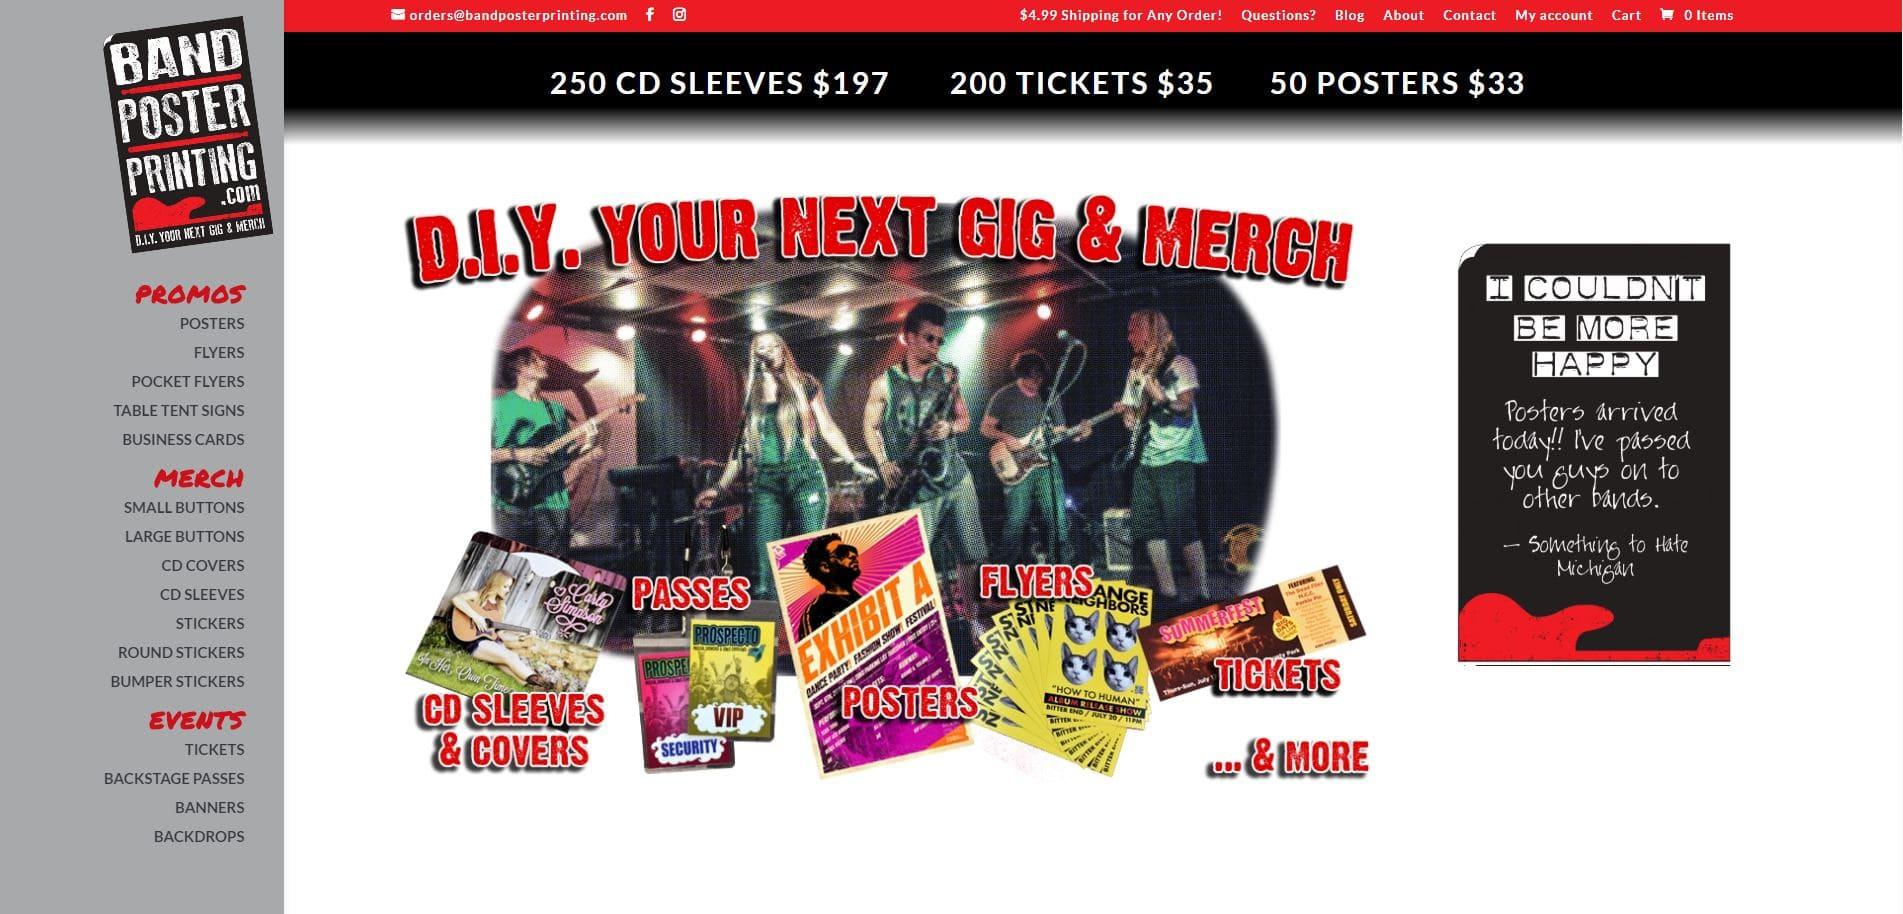 Band Poster Printing Website Design by Purple Gen - Purple-Gen.com